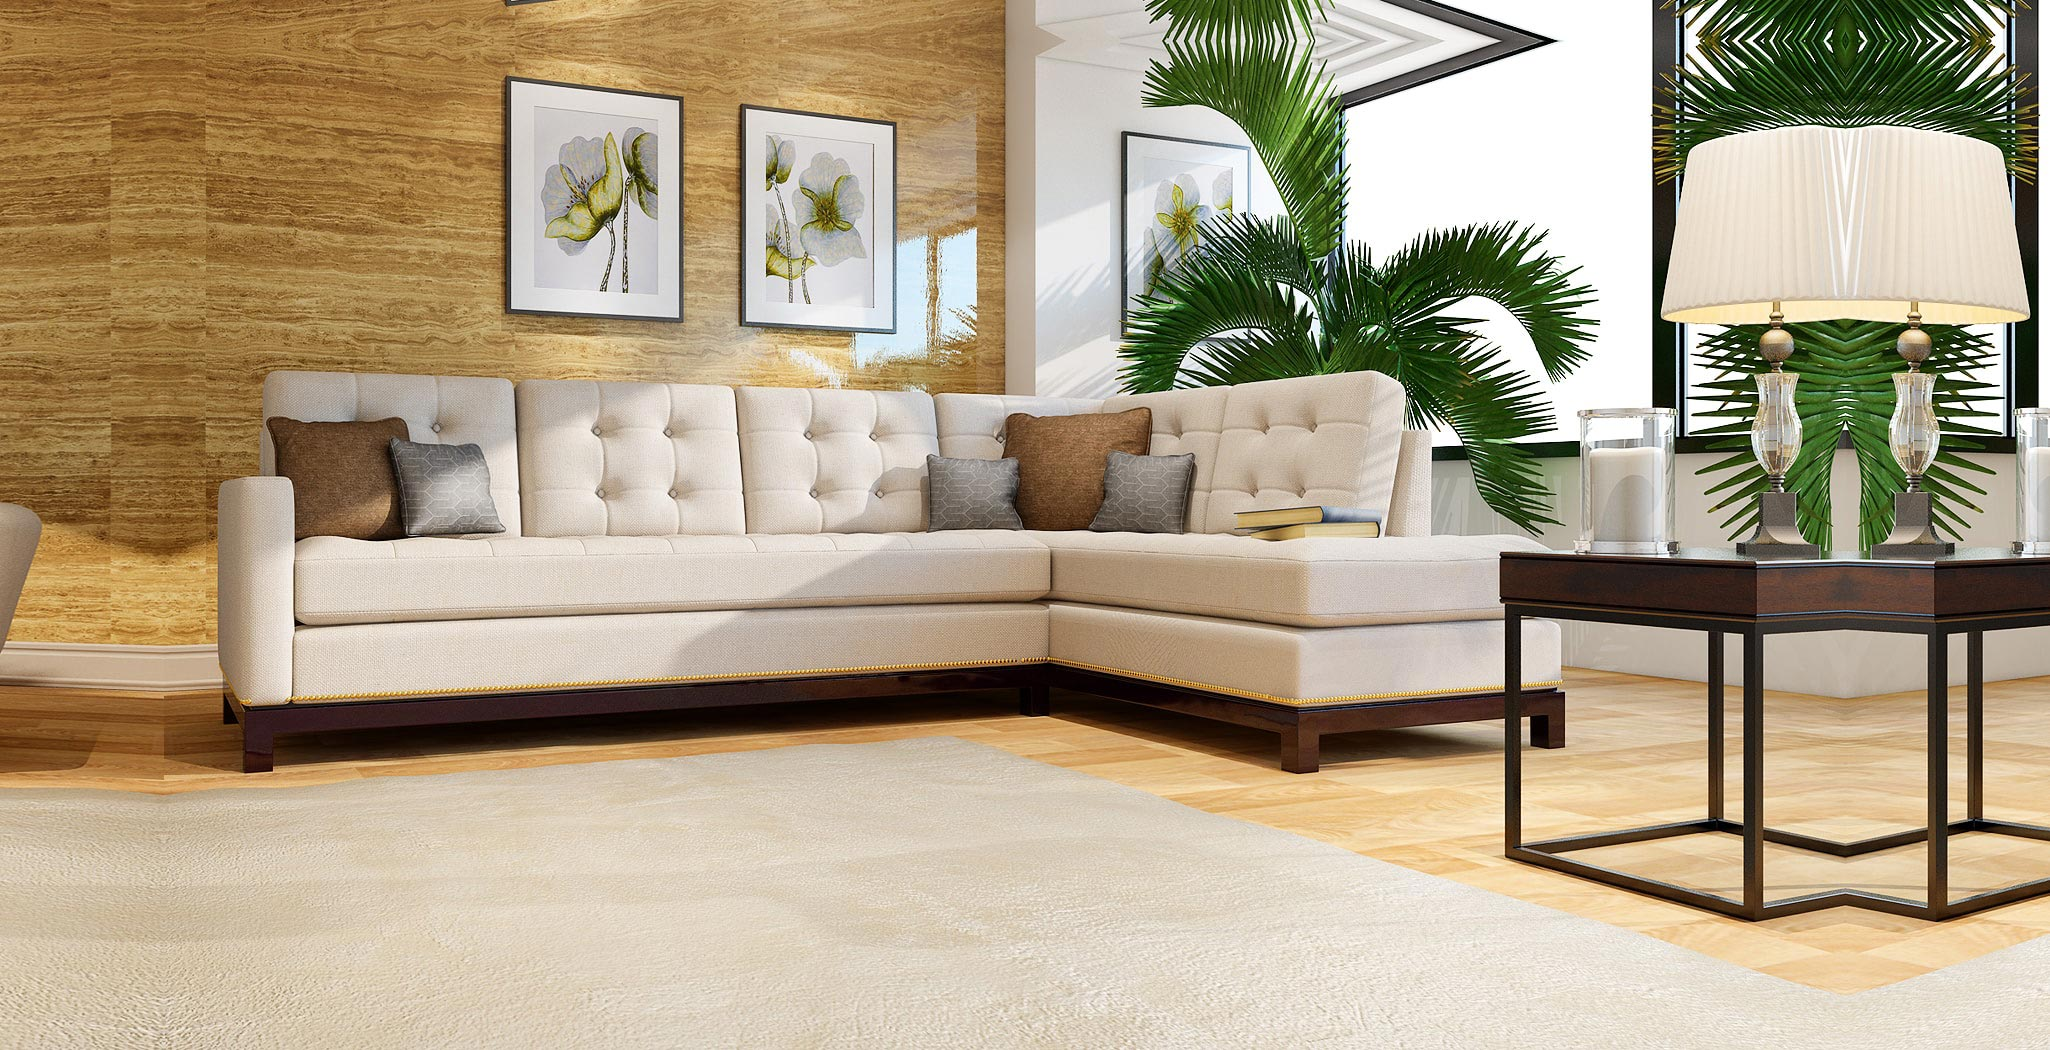 davos panel furniture gallery 1